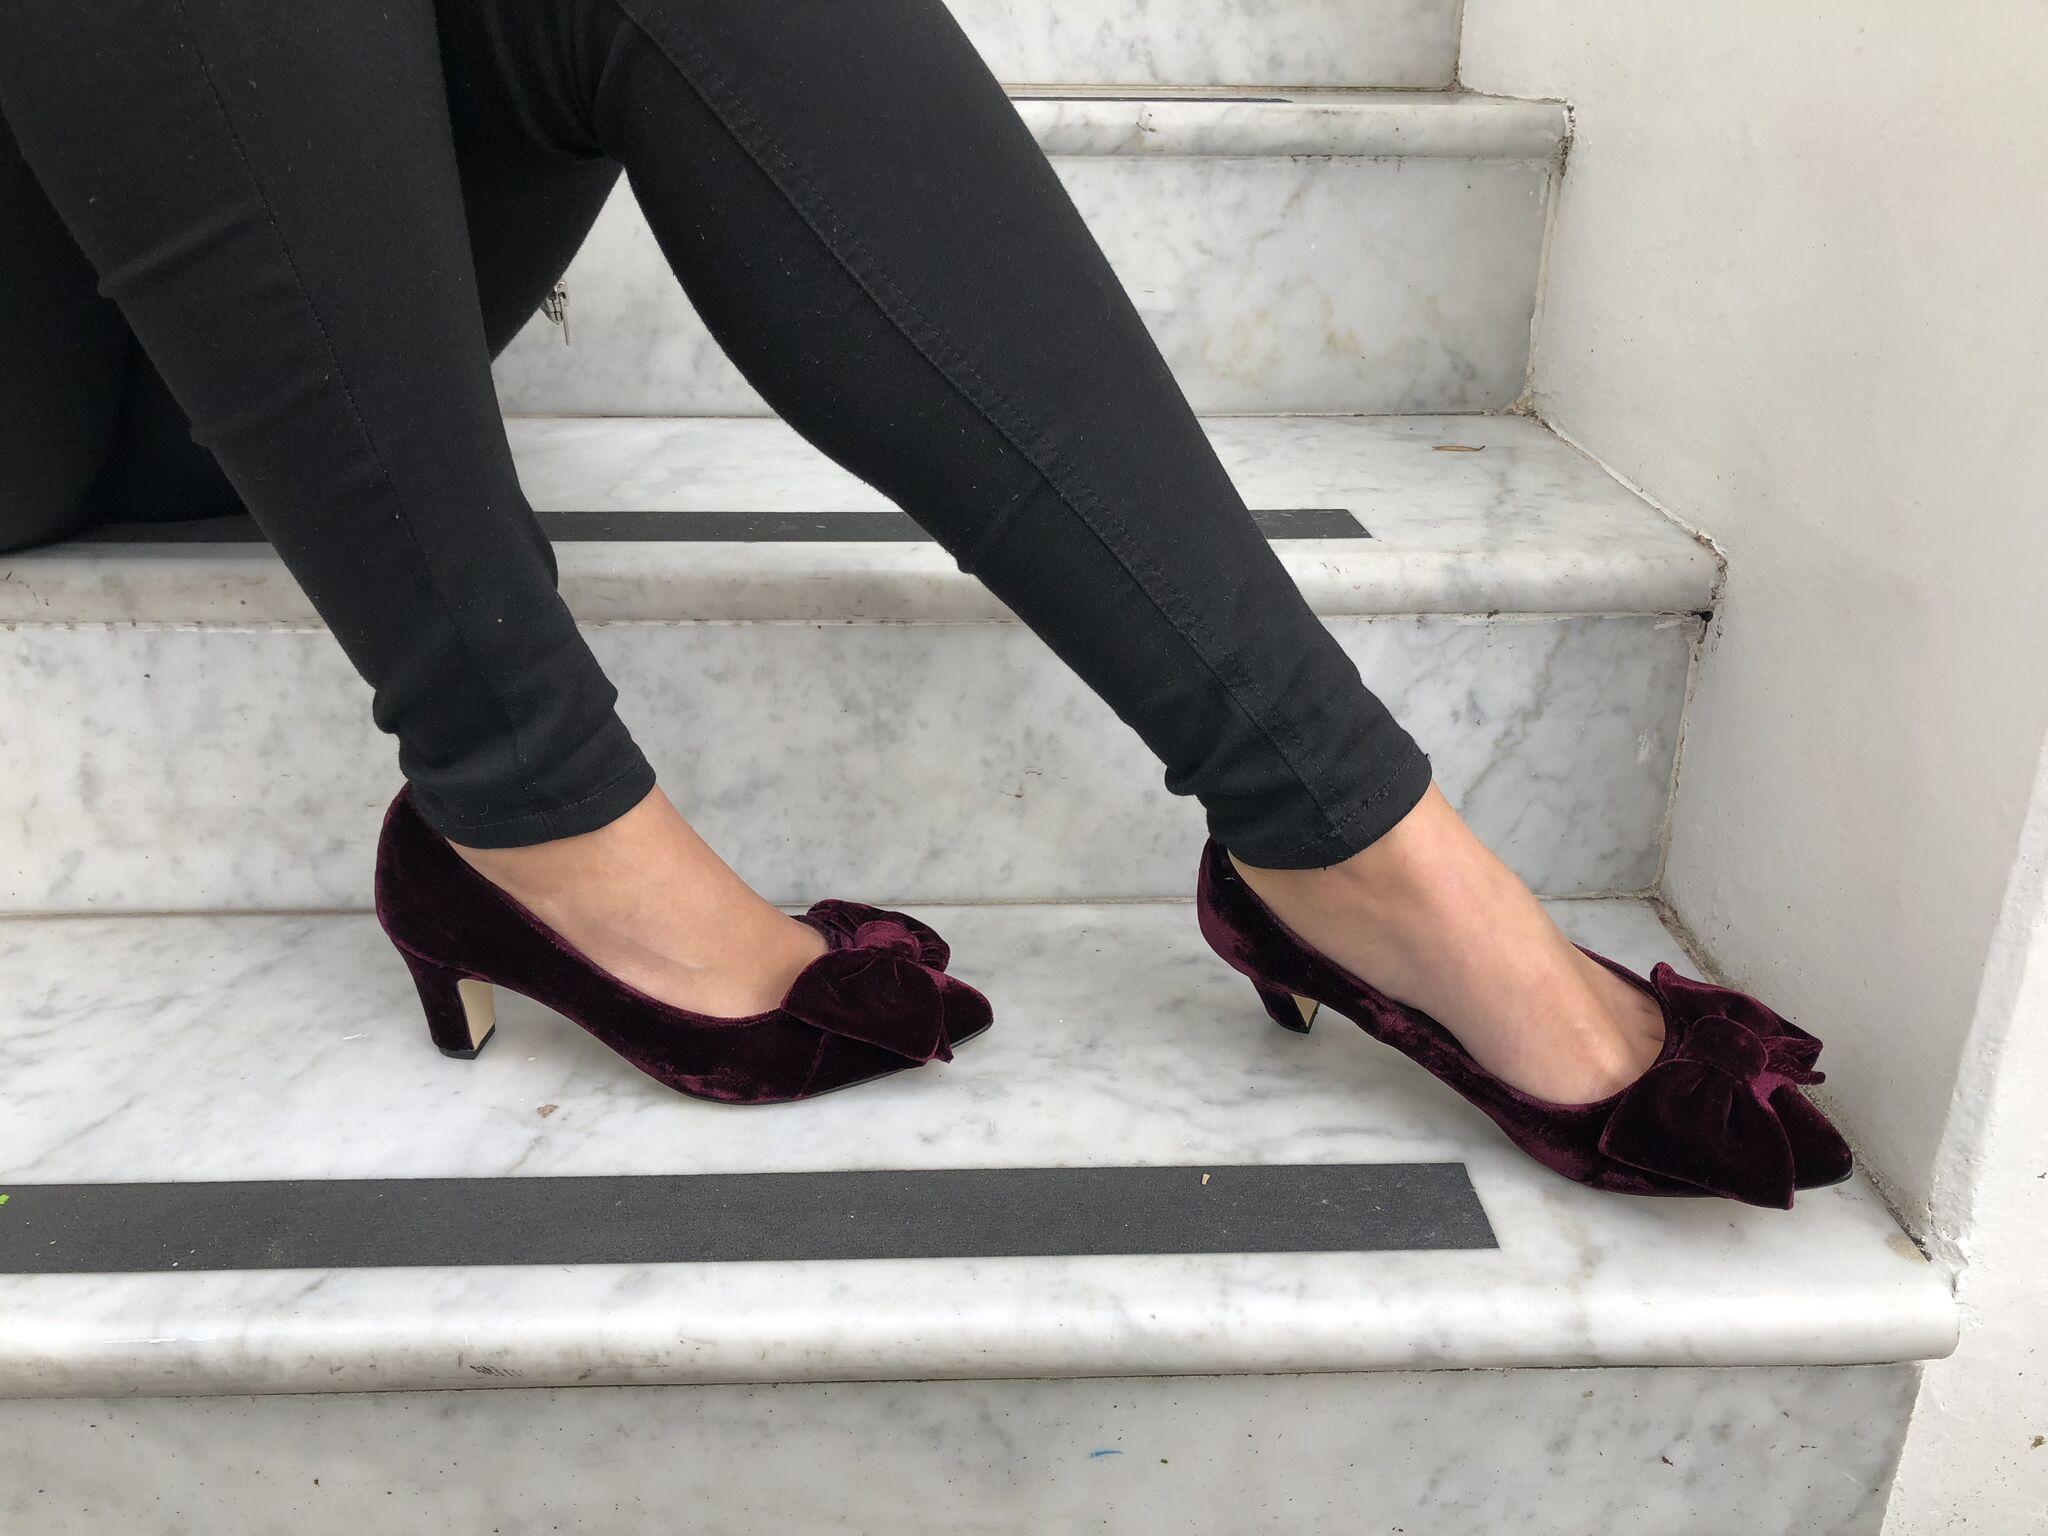 6a5cf4b5784c CAMILLA WIDE FIT COURT SHOES – BURGUNDY VELVET  Velvet   ShoesThatDontSqueeze  WideFit  Burgundy  CourtShoes